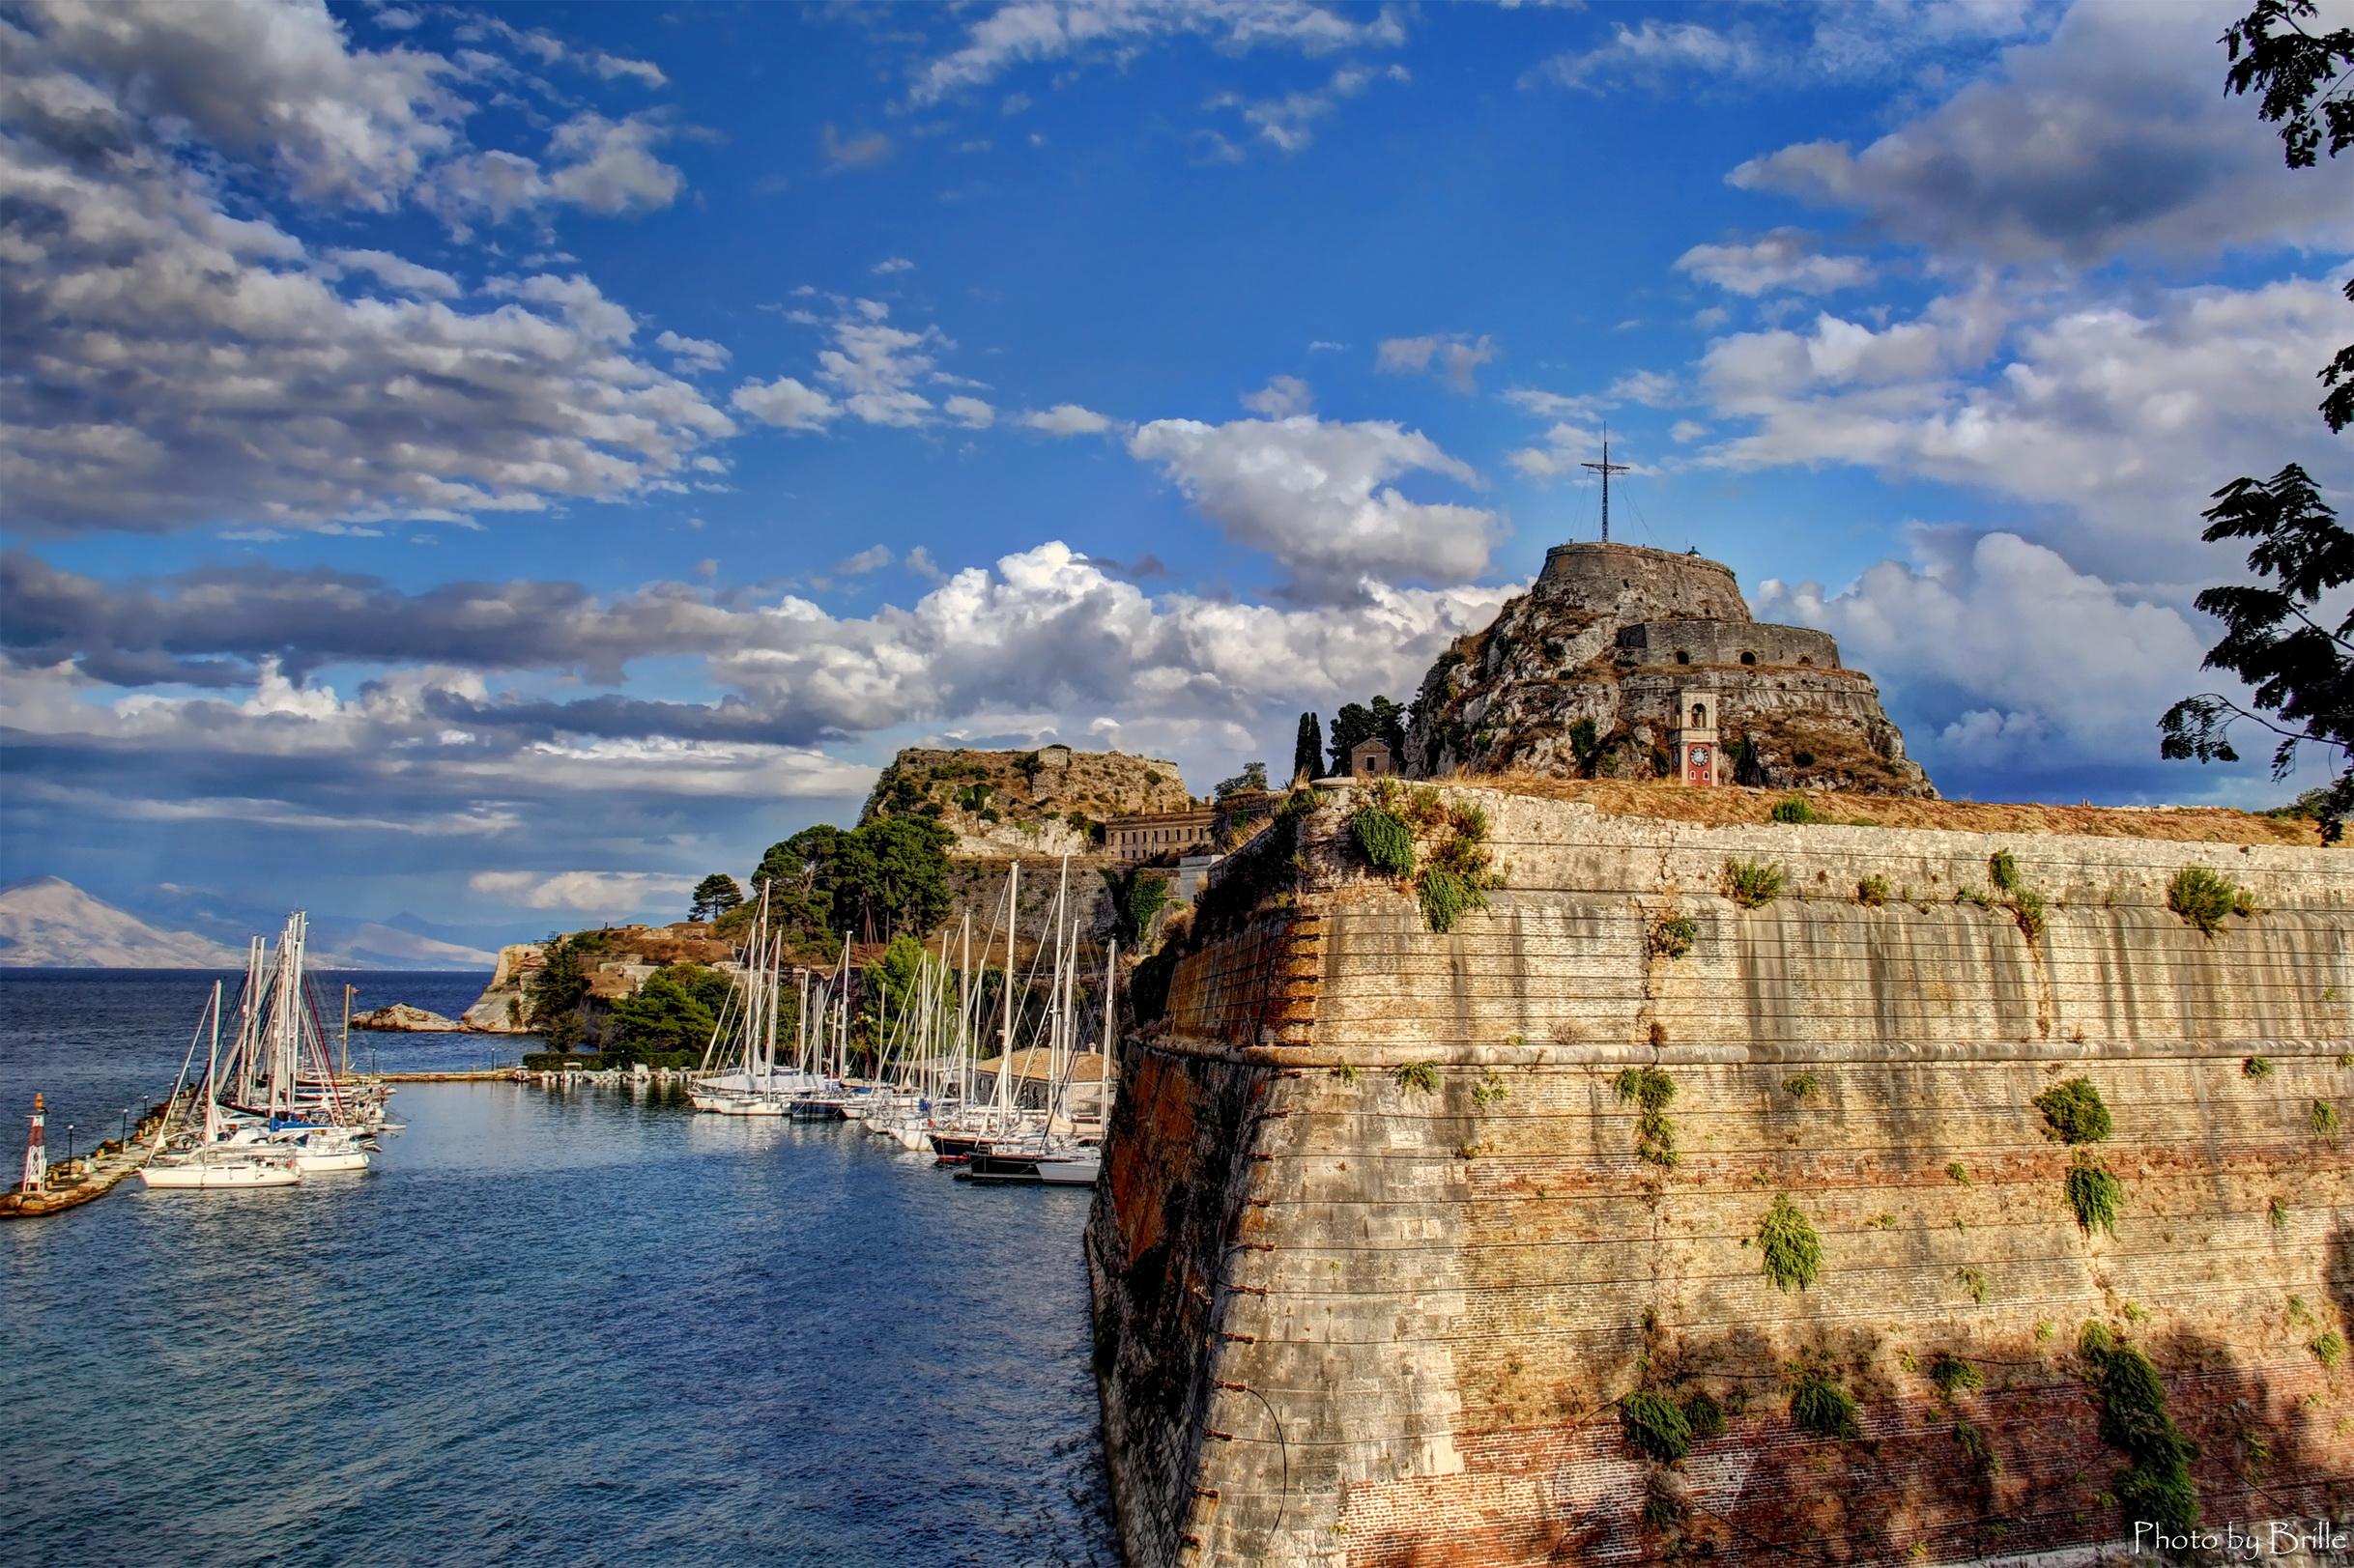 Wallpapers Greece Corfu Sky Coast Cities Clouds 2436x1623 2436x1623